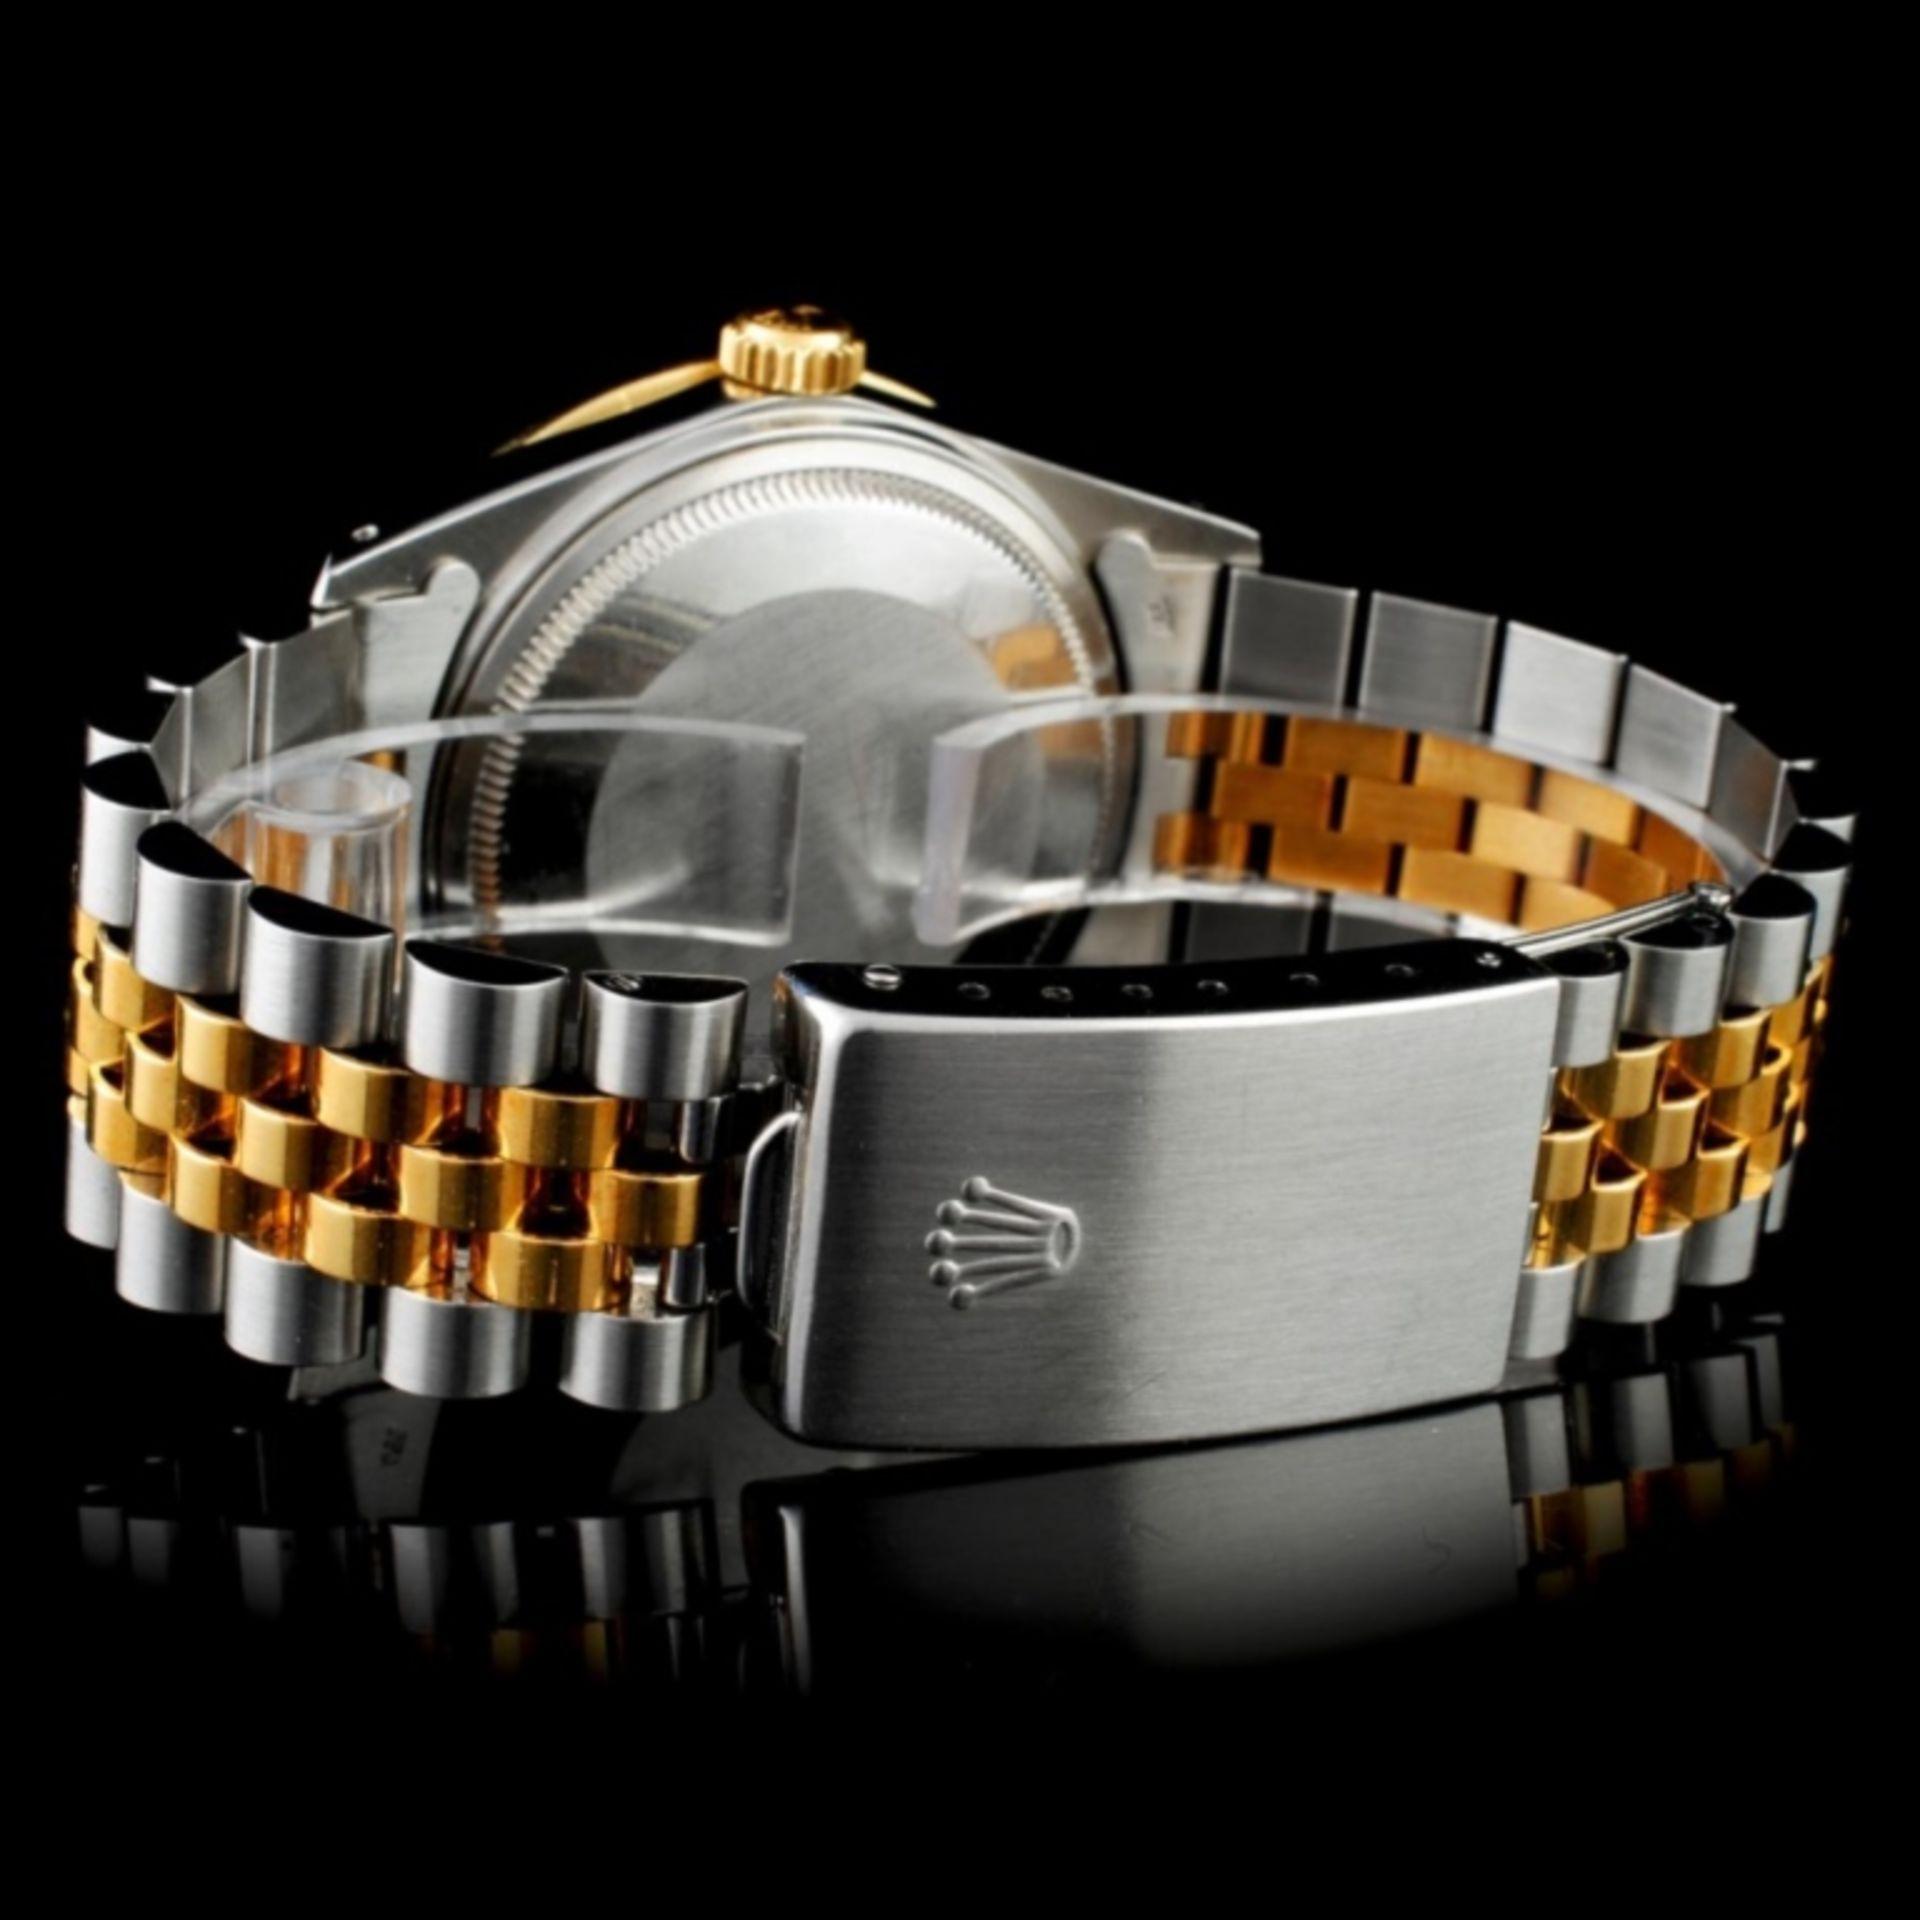 Rolex DateJust 18K/SS Diamond 36mm Watch - Image 3 of 5